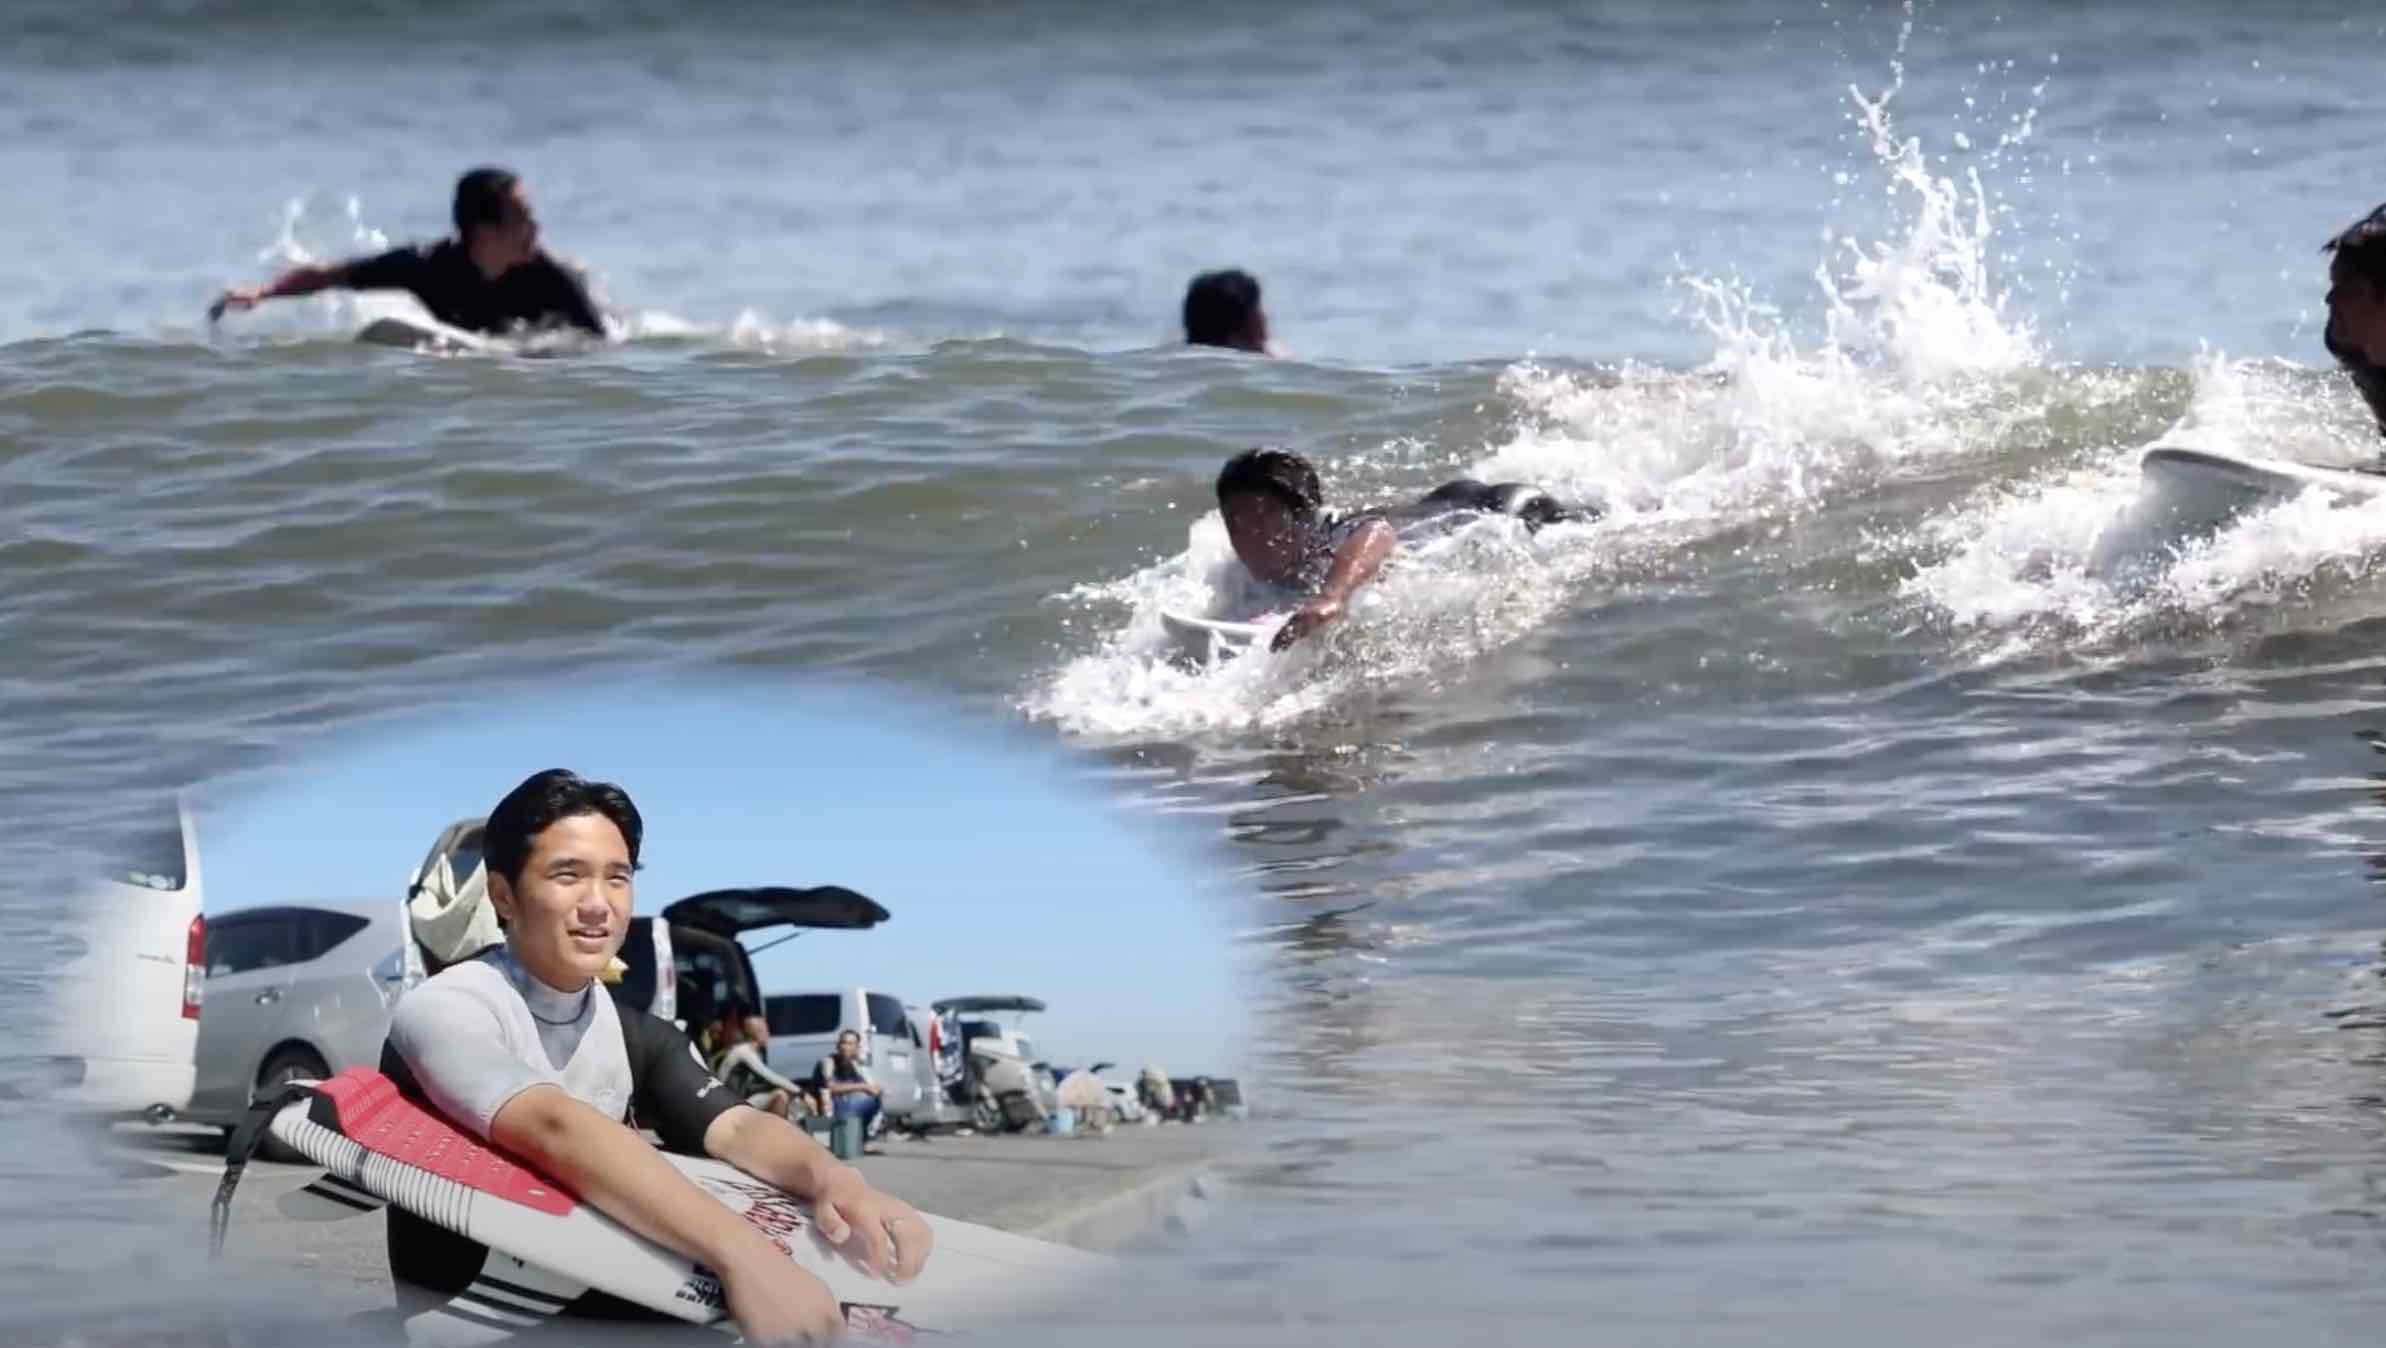 【How to】これを知ればもっと波をキャッチできる! 一番速いパドル方法を村田嵐が検証!